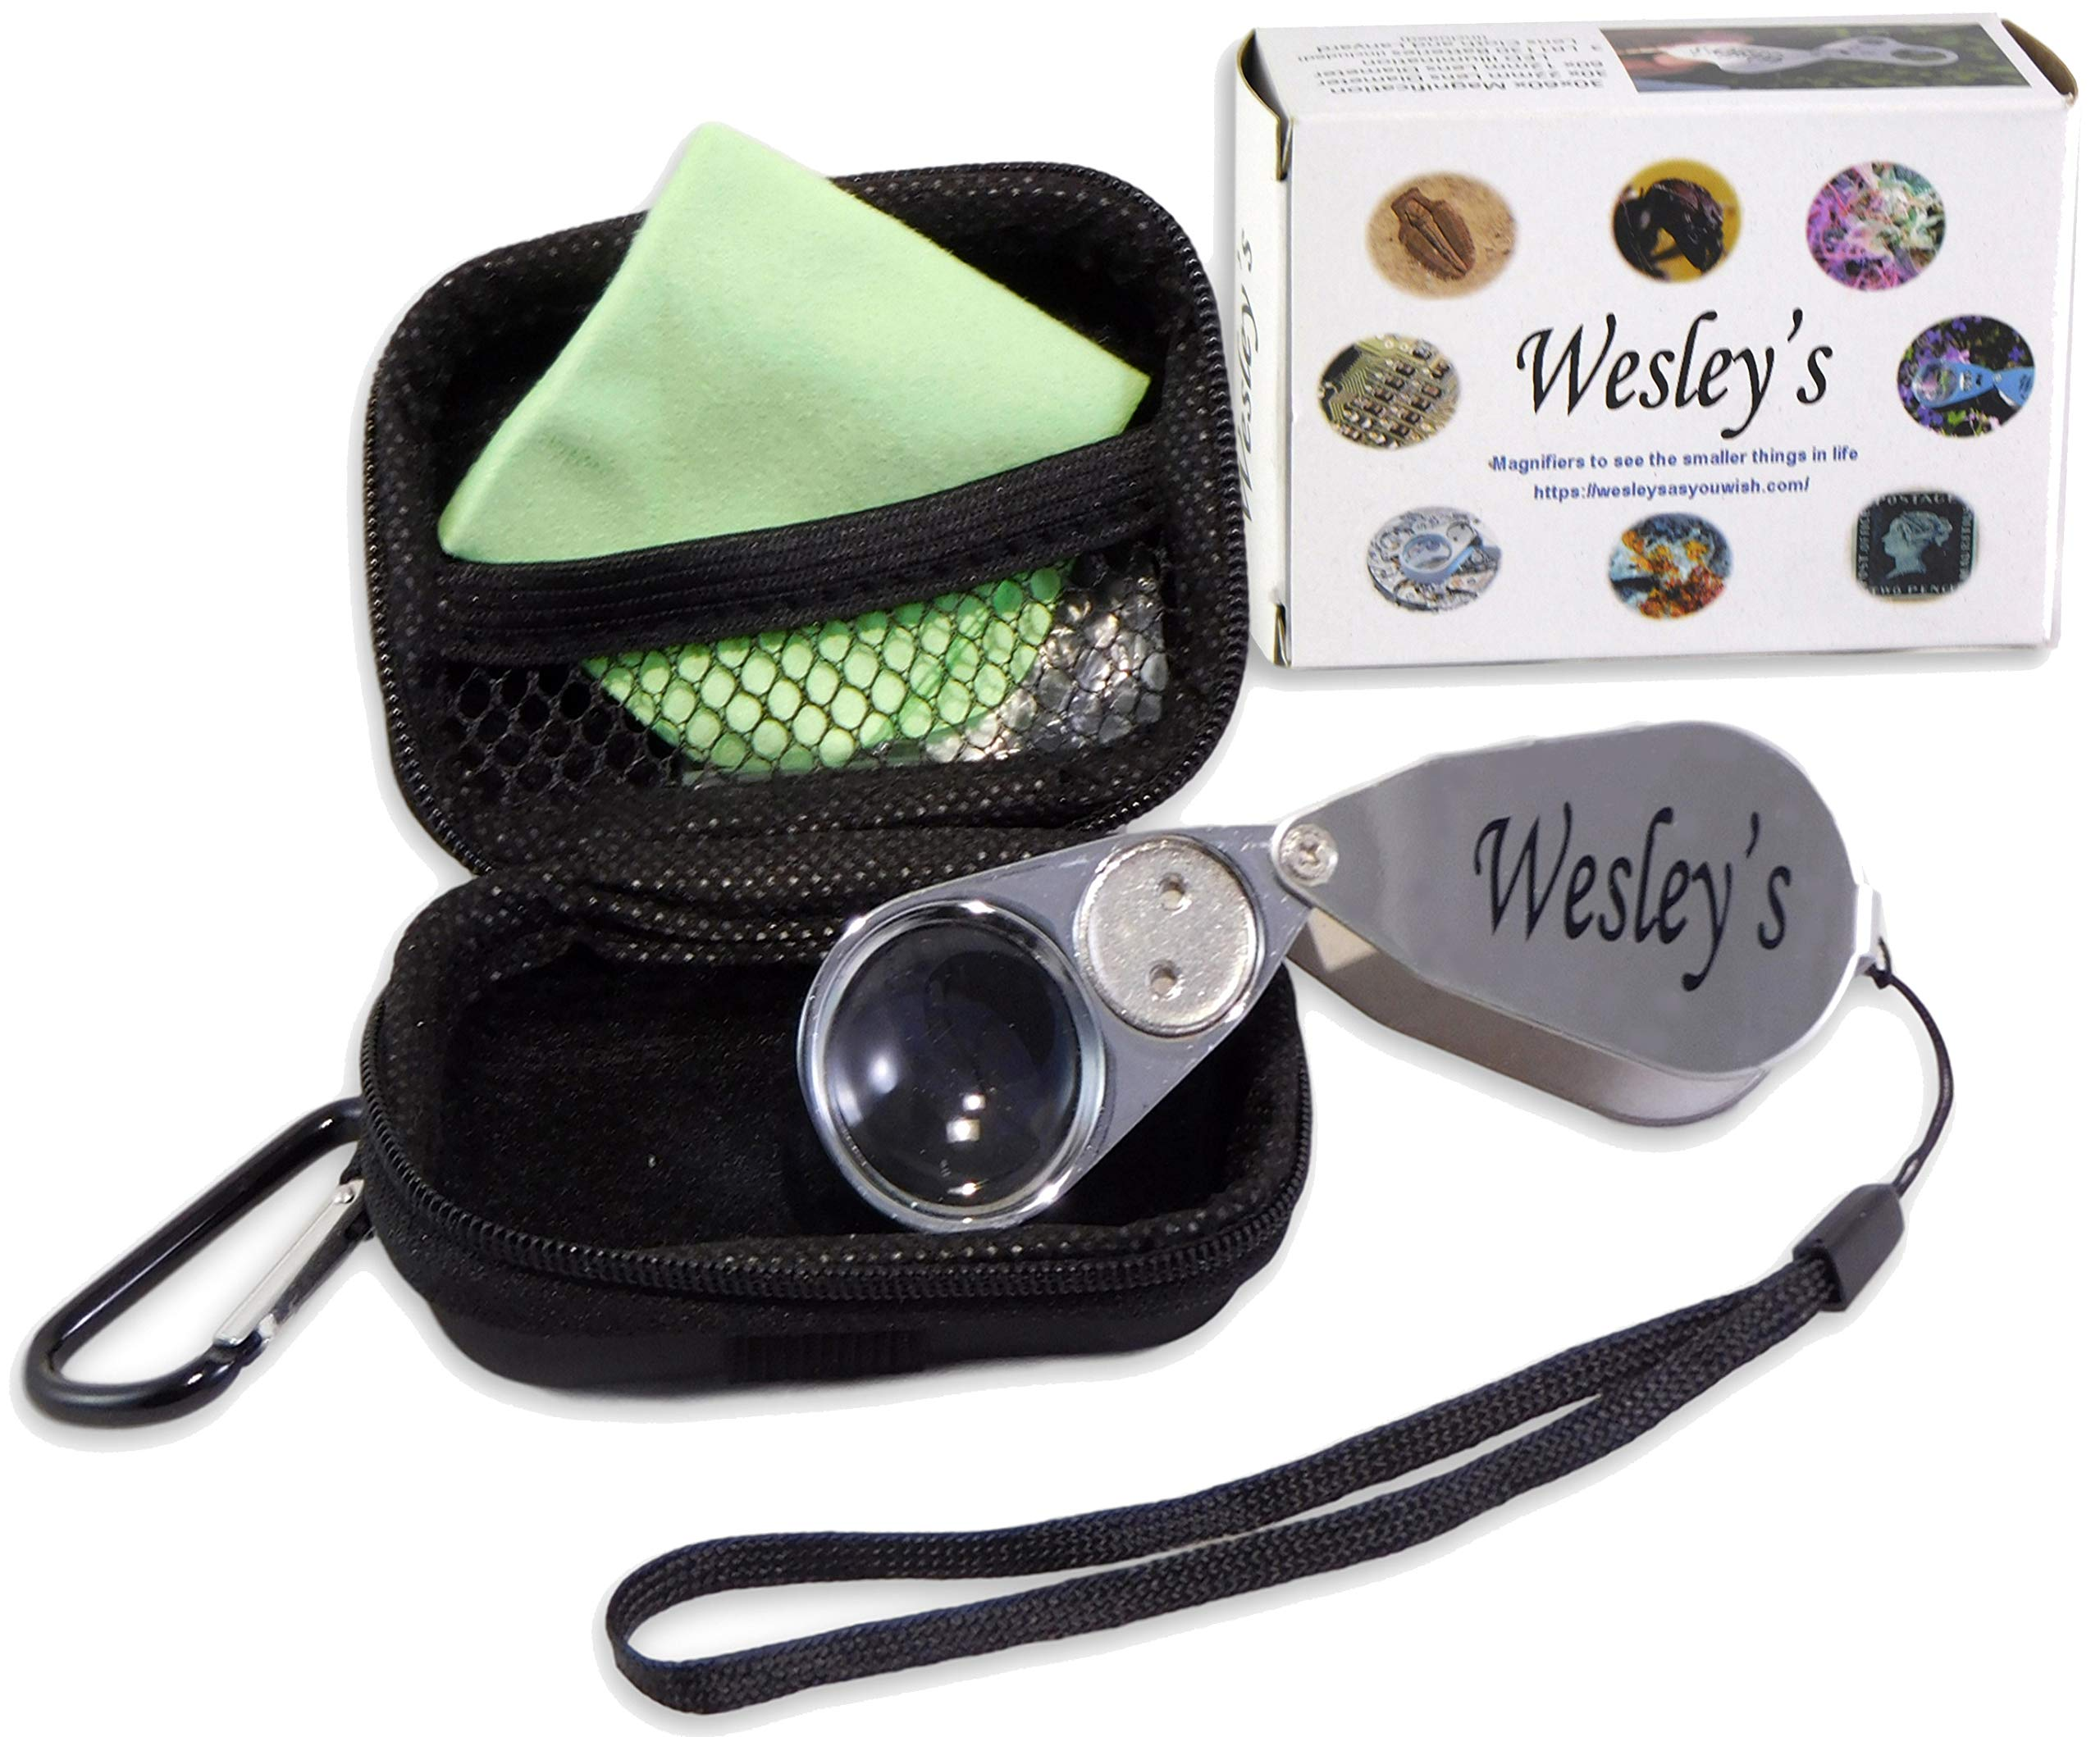 JahyShow 40X Full Metal Illuminated Jewelry Loop Magnifier,Hand Lens Botany,Pocket Folding Magnifying Glass Jewelers Eye Loupe LED and UV Light LED Currency Detecting//Jewlers Identifying Type Lupe